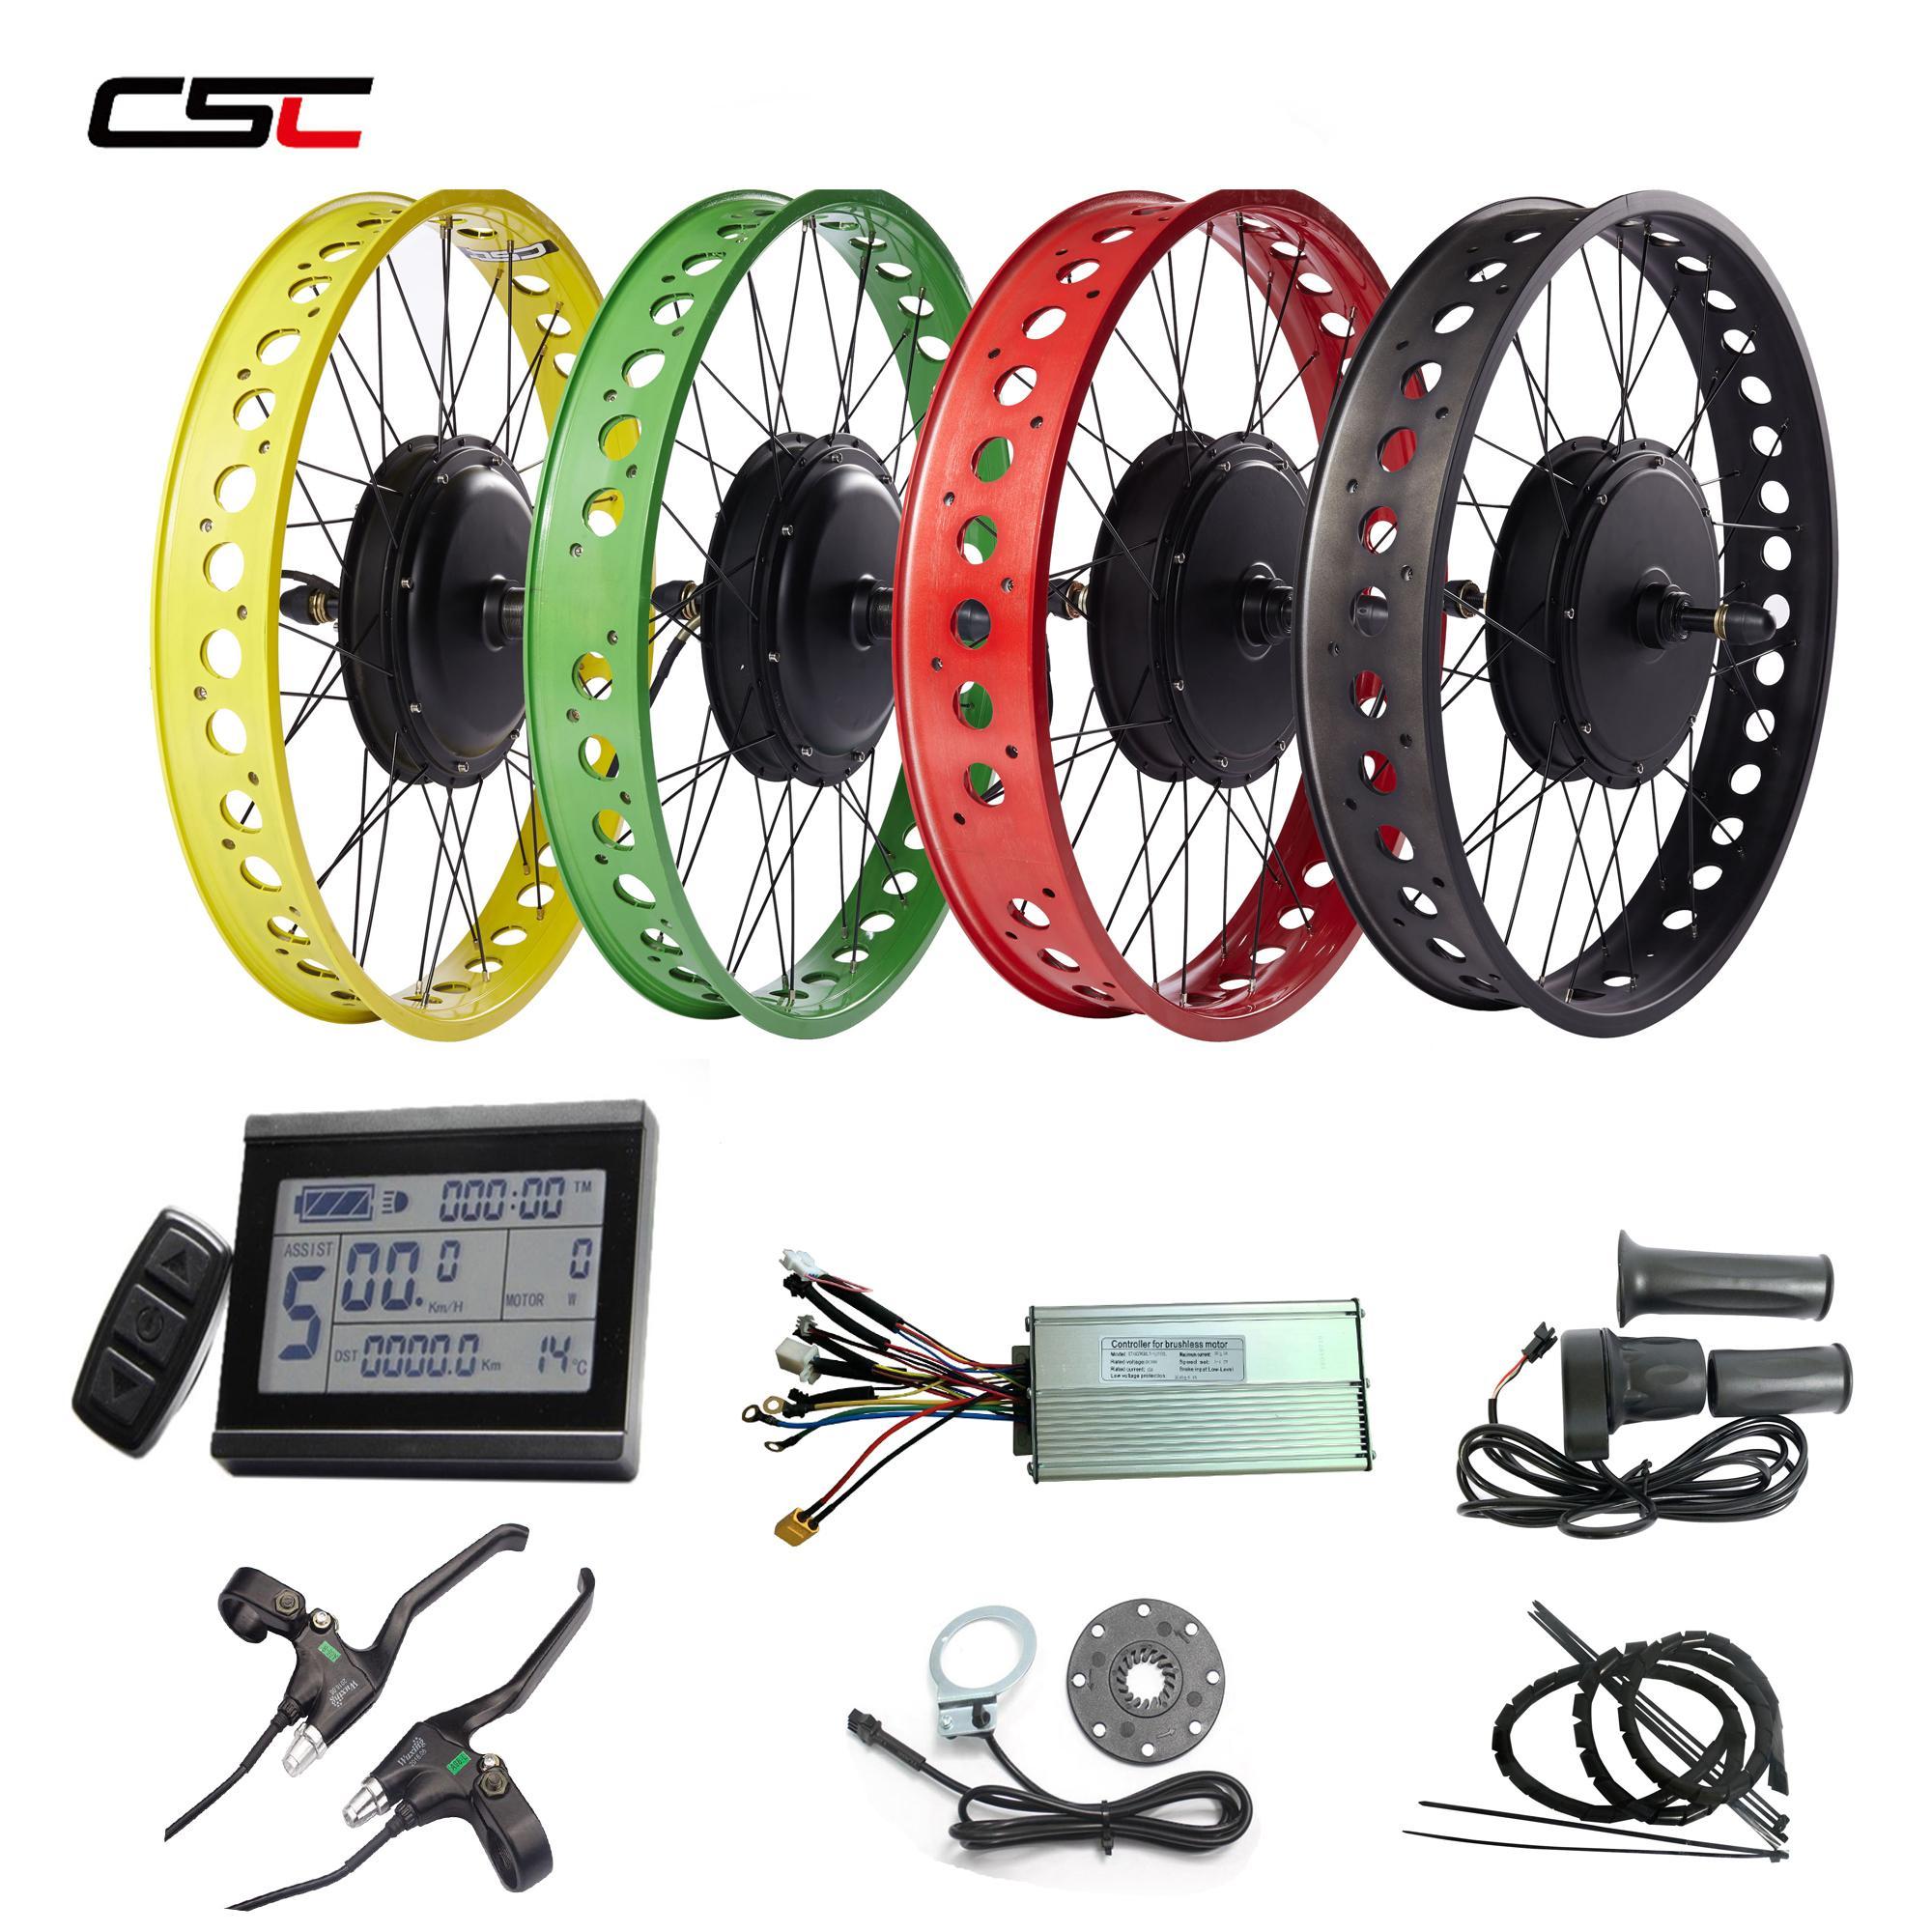 Neige Support Kit de conversion Bluetooth 48 V 1000 W 4.0 pneu Fat Bike Motor roue